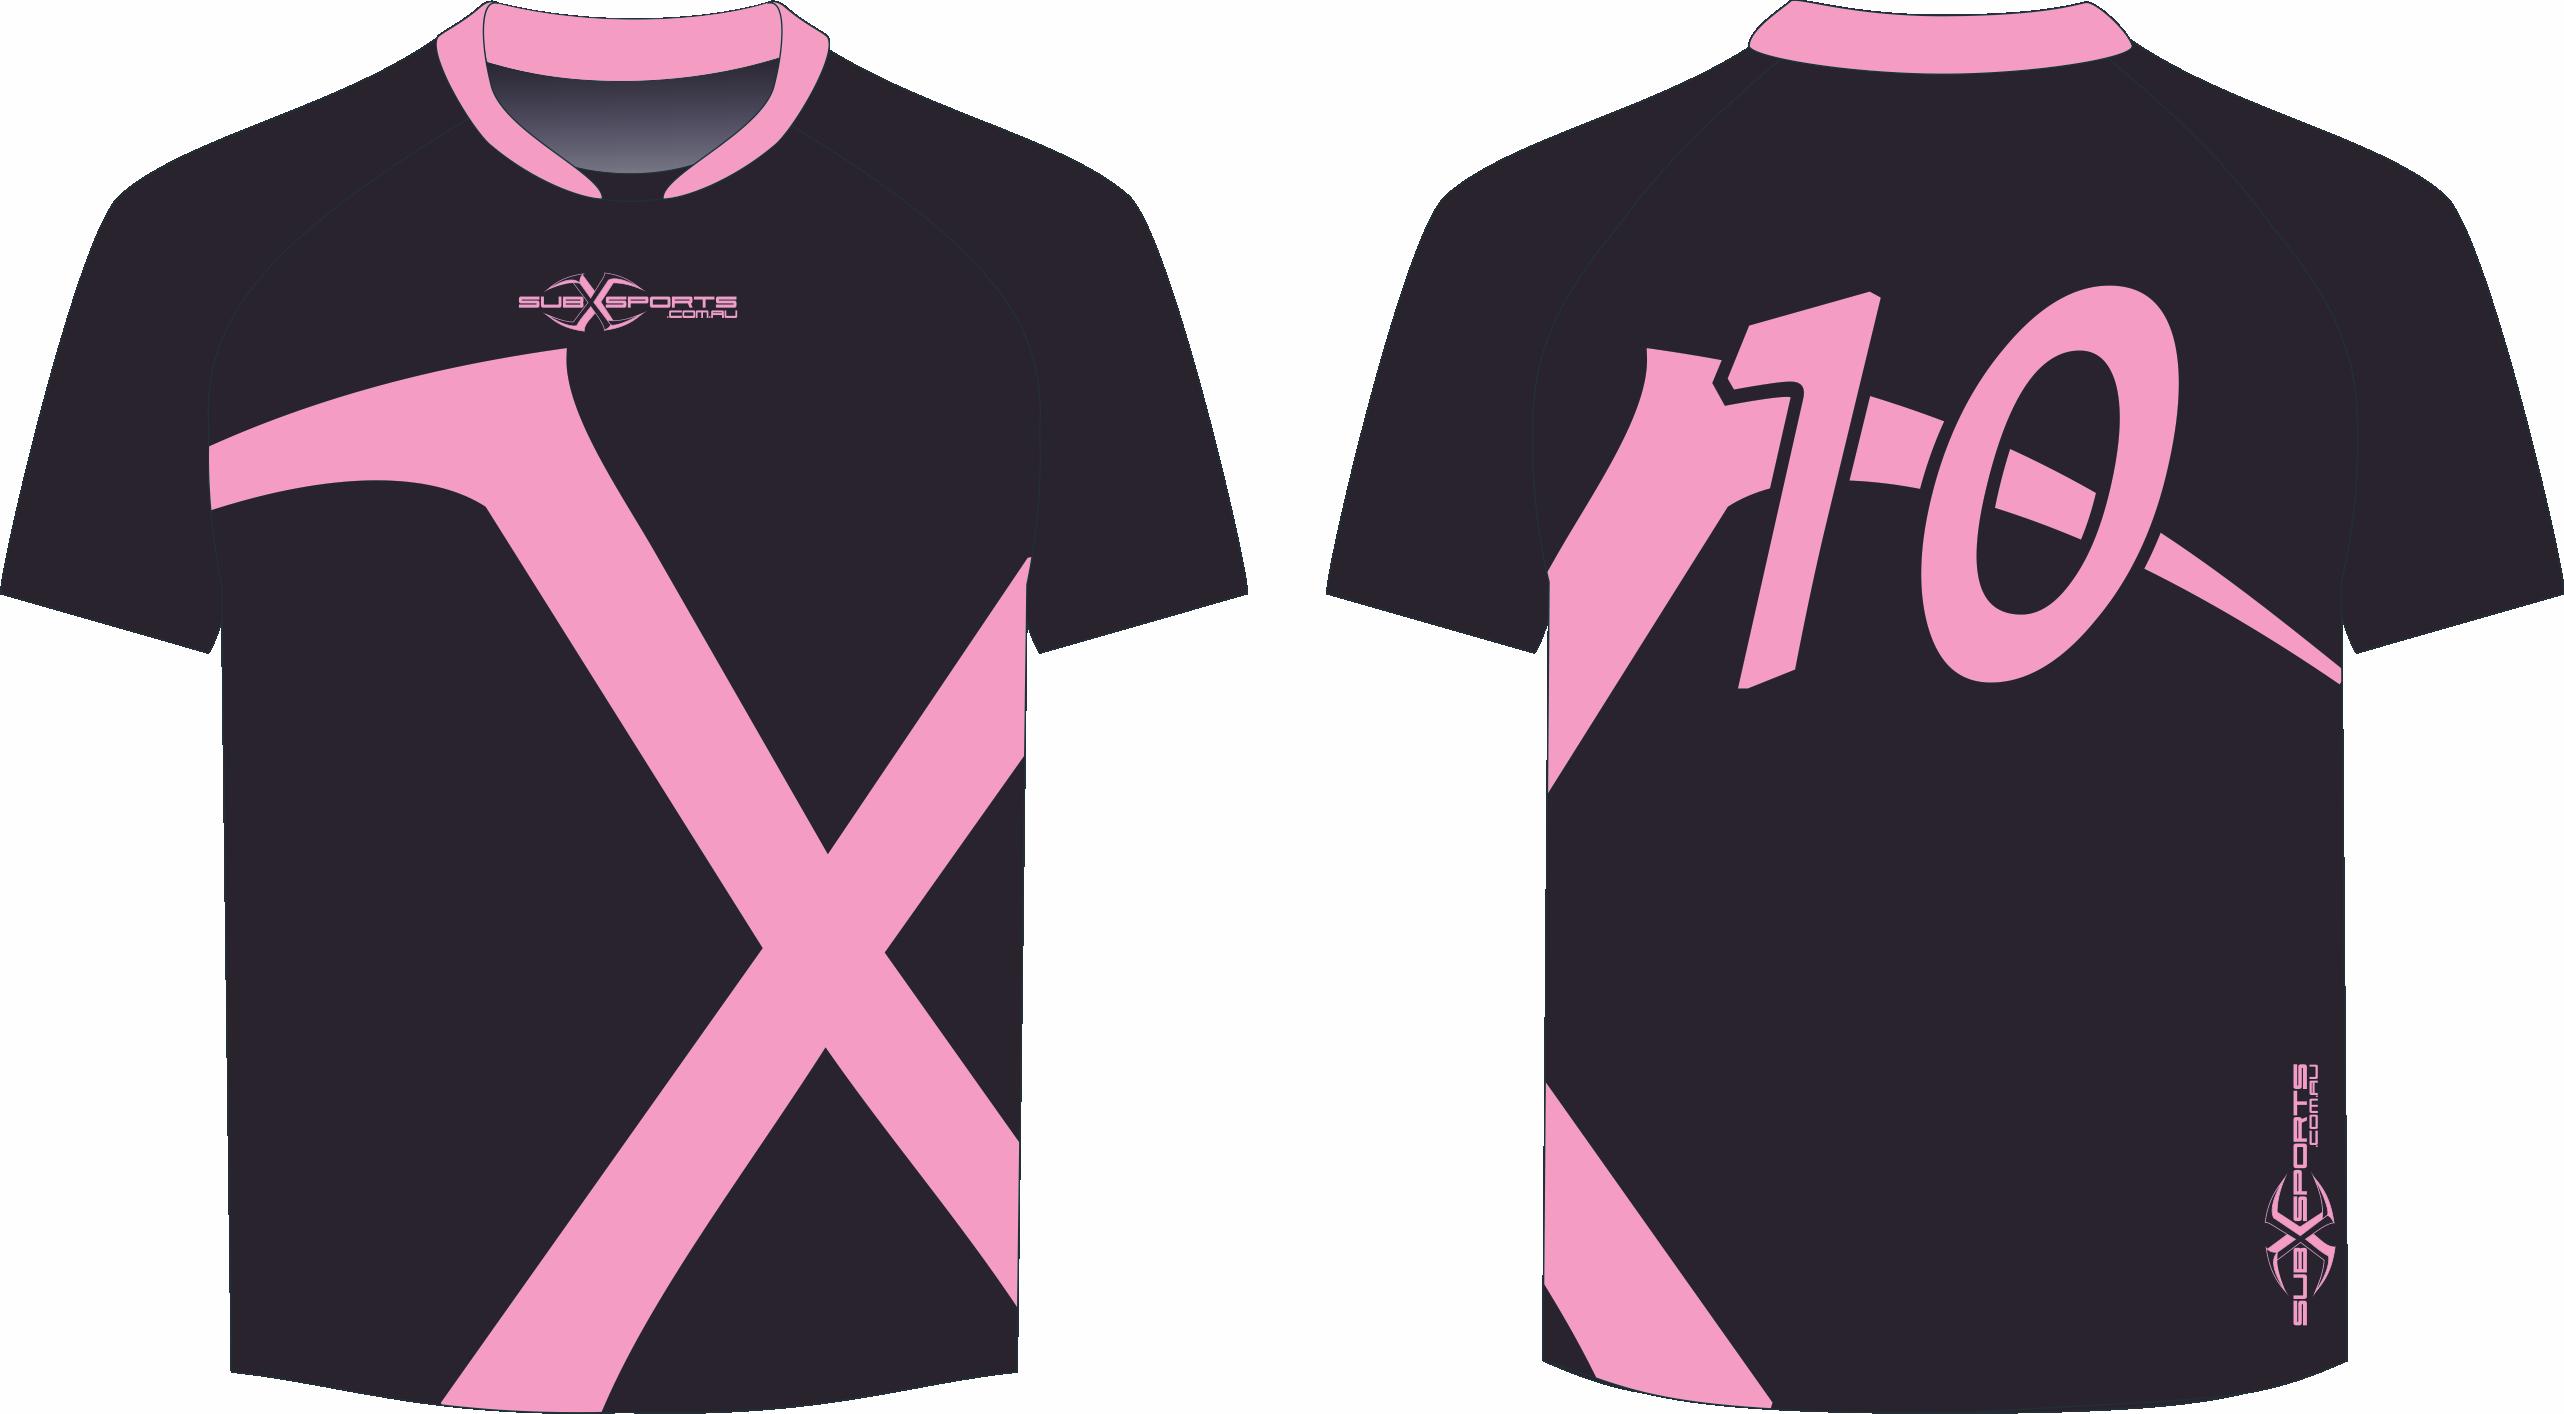 X301XJ Black Pink Jerseys.png